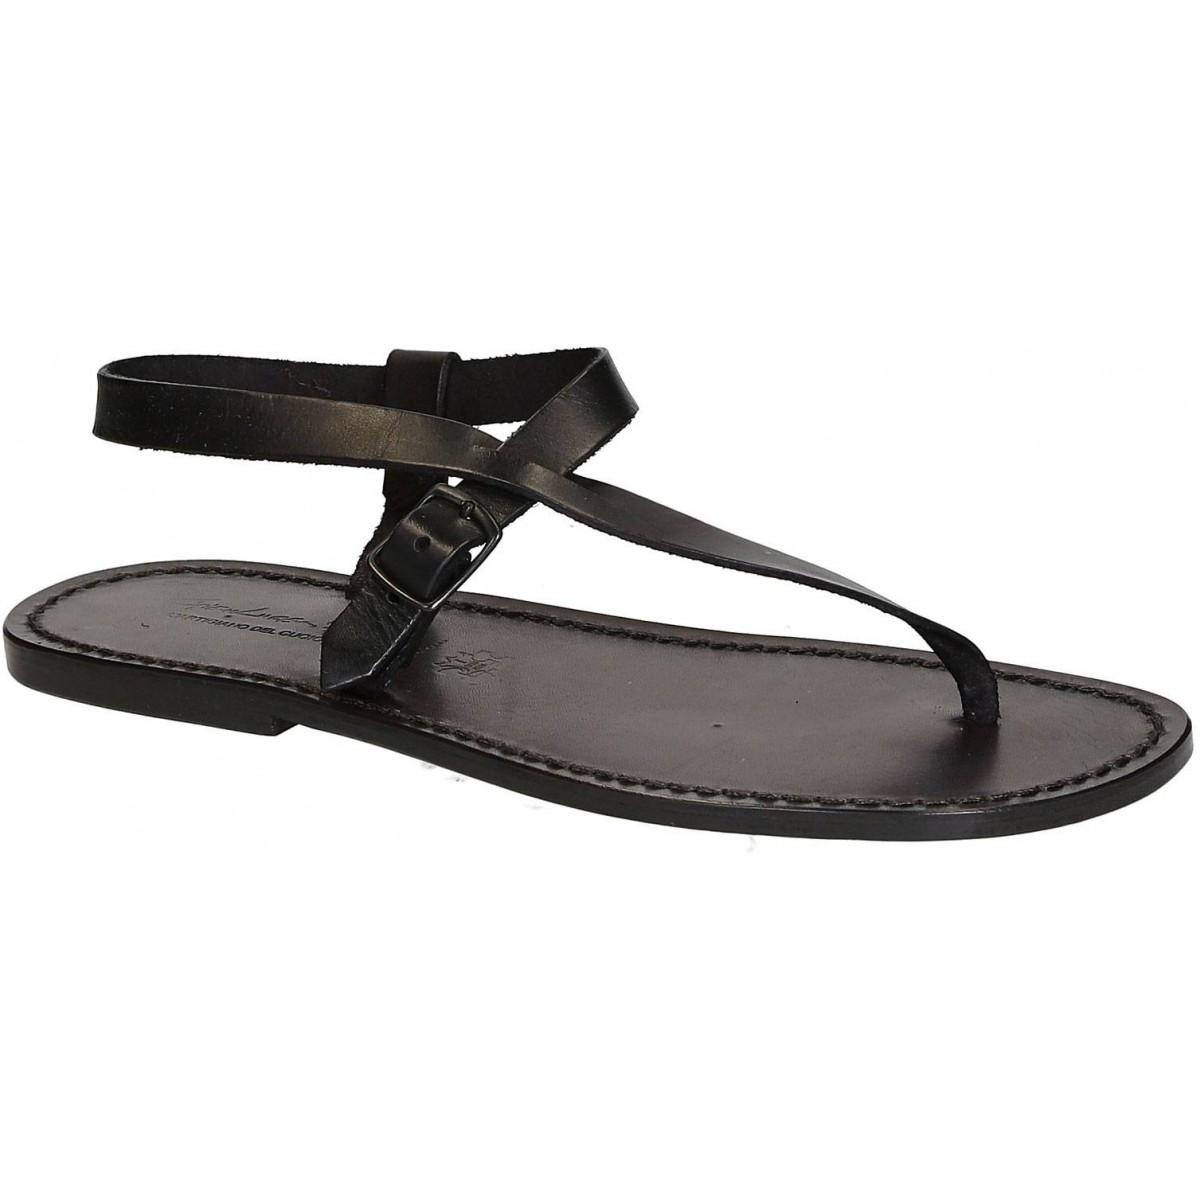 de49e19696f6 Herren Flip-Flop-Sandalen aus schwarze Leder in Italien von Handgefertigt